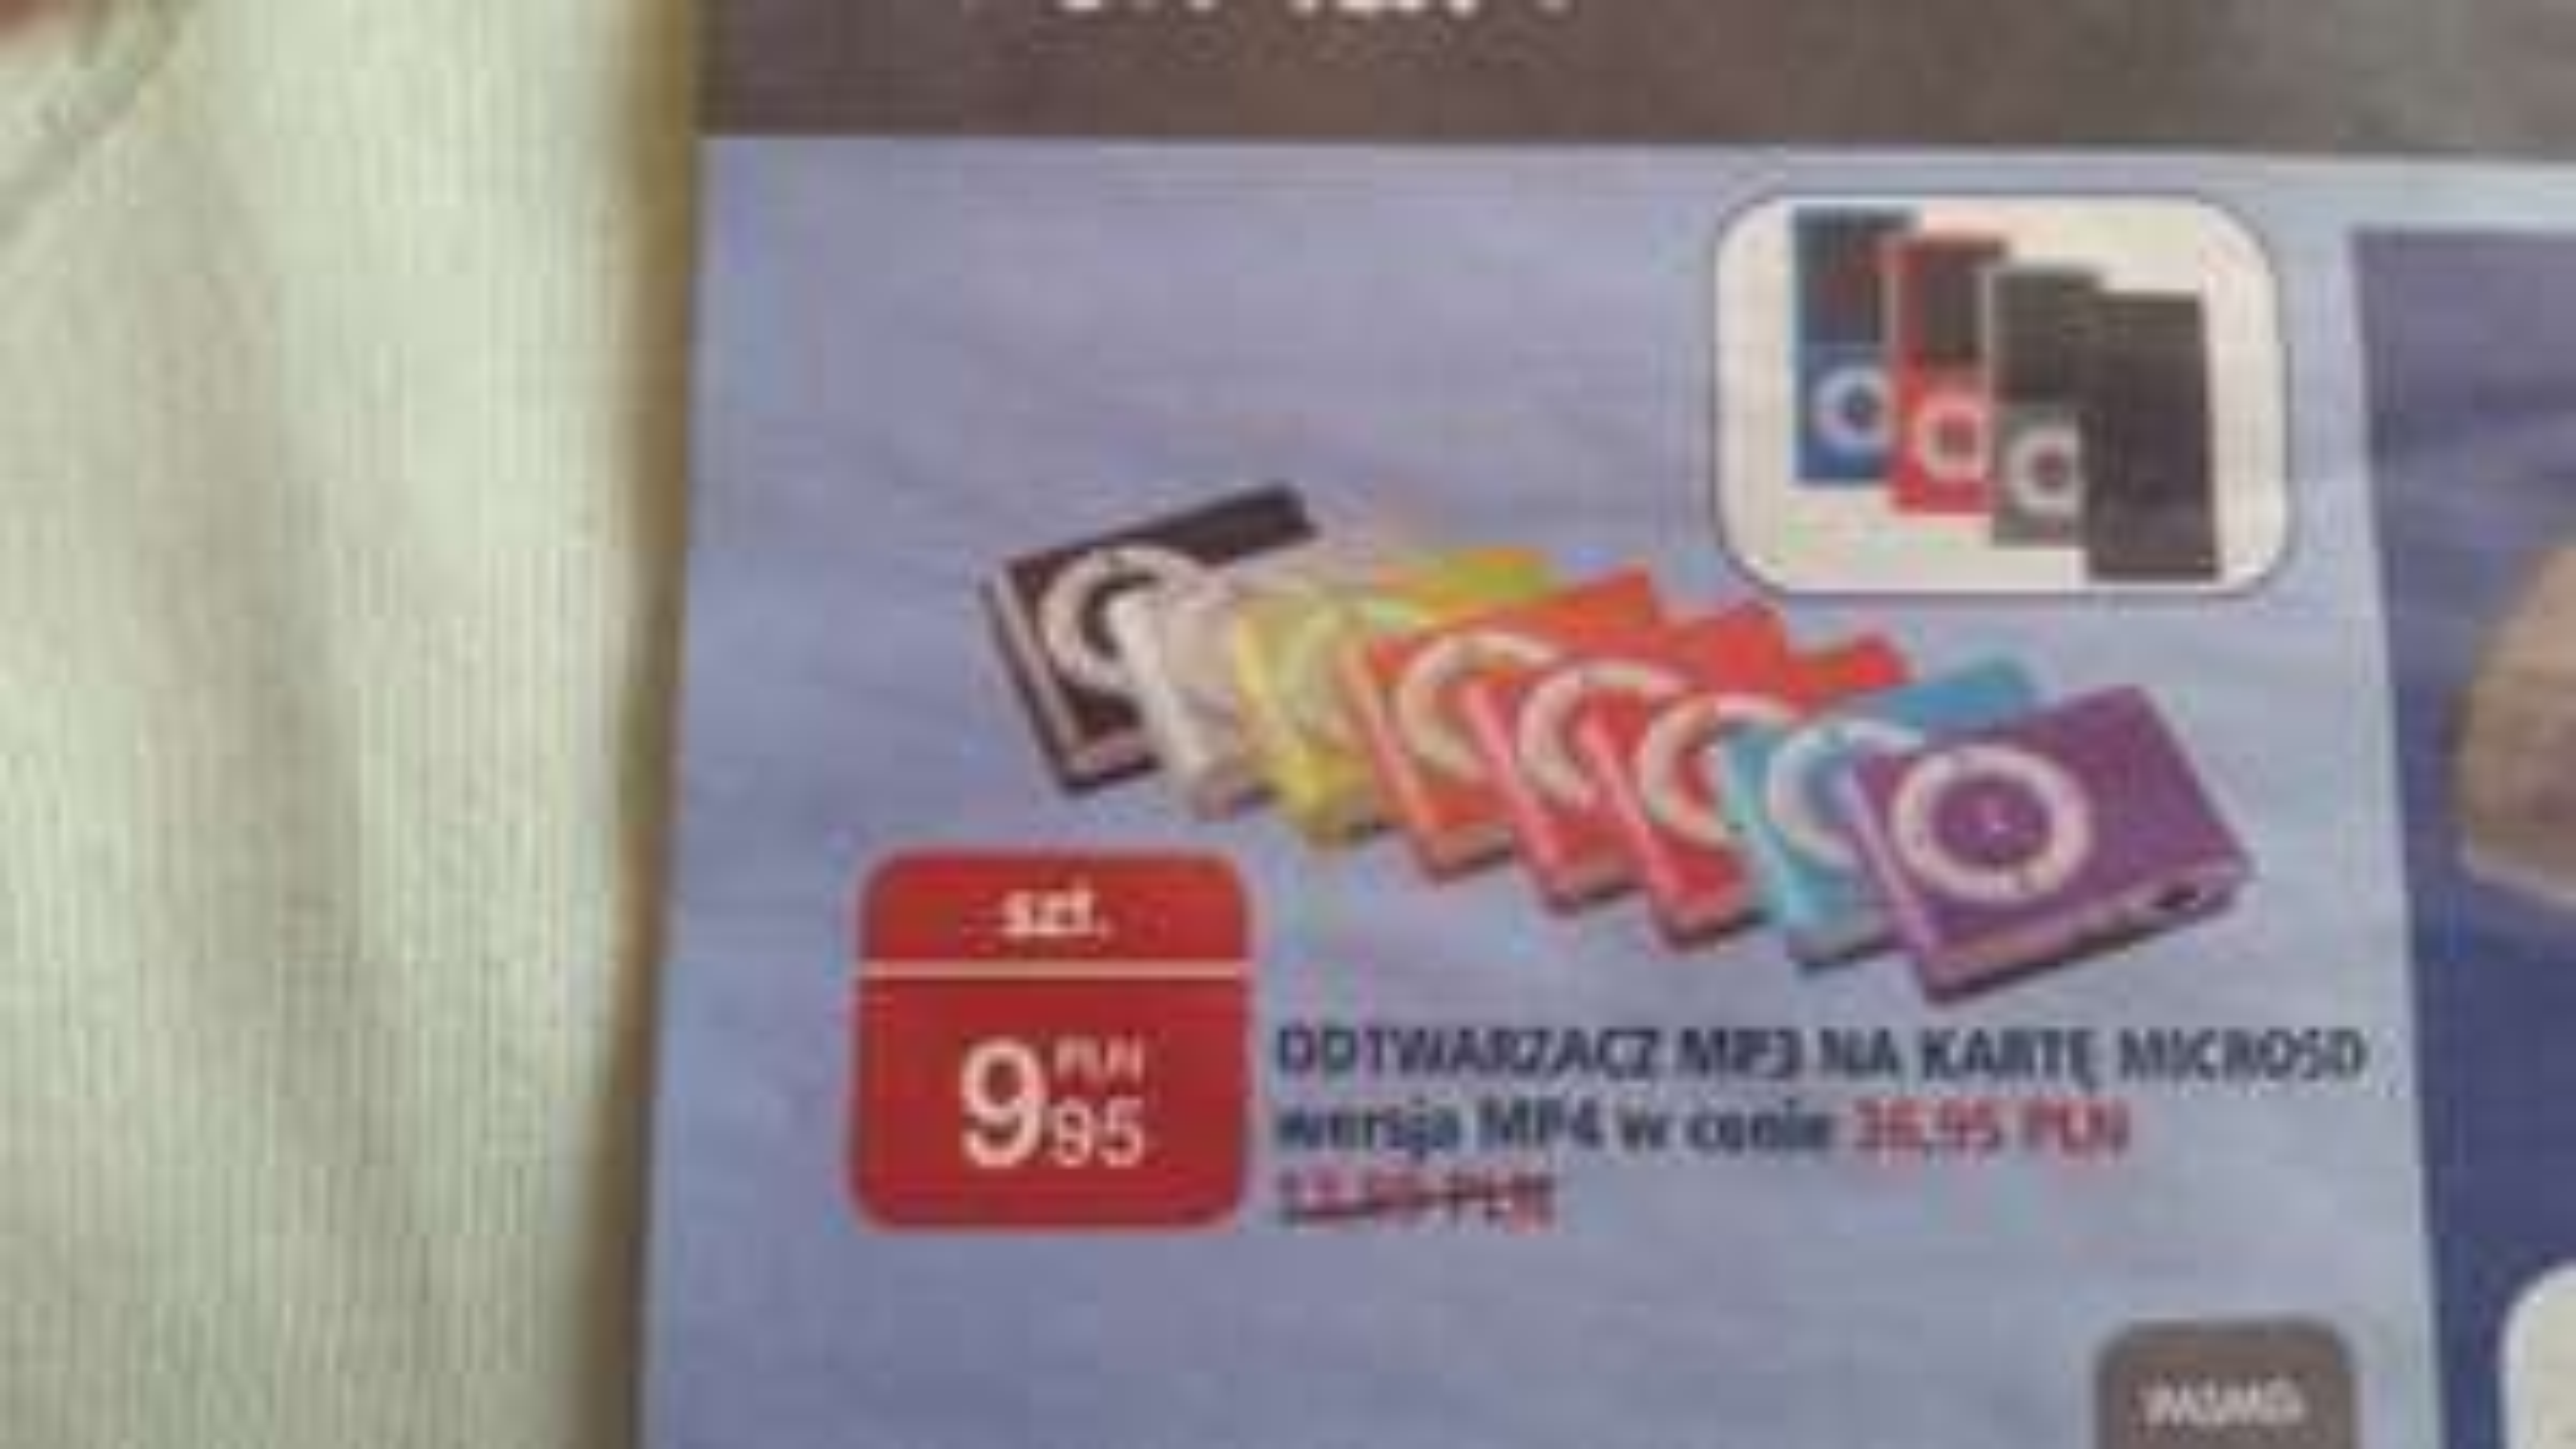 Odtwarzacz mp3/ mp4 na karte microsd